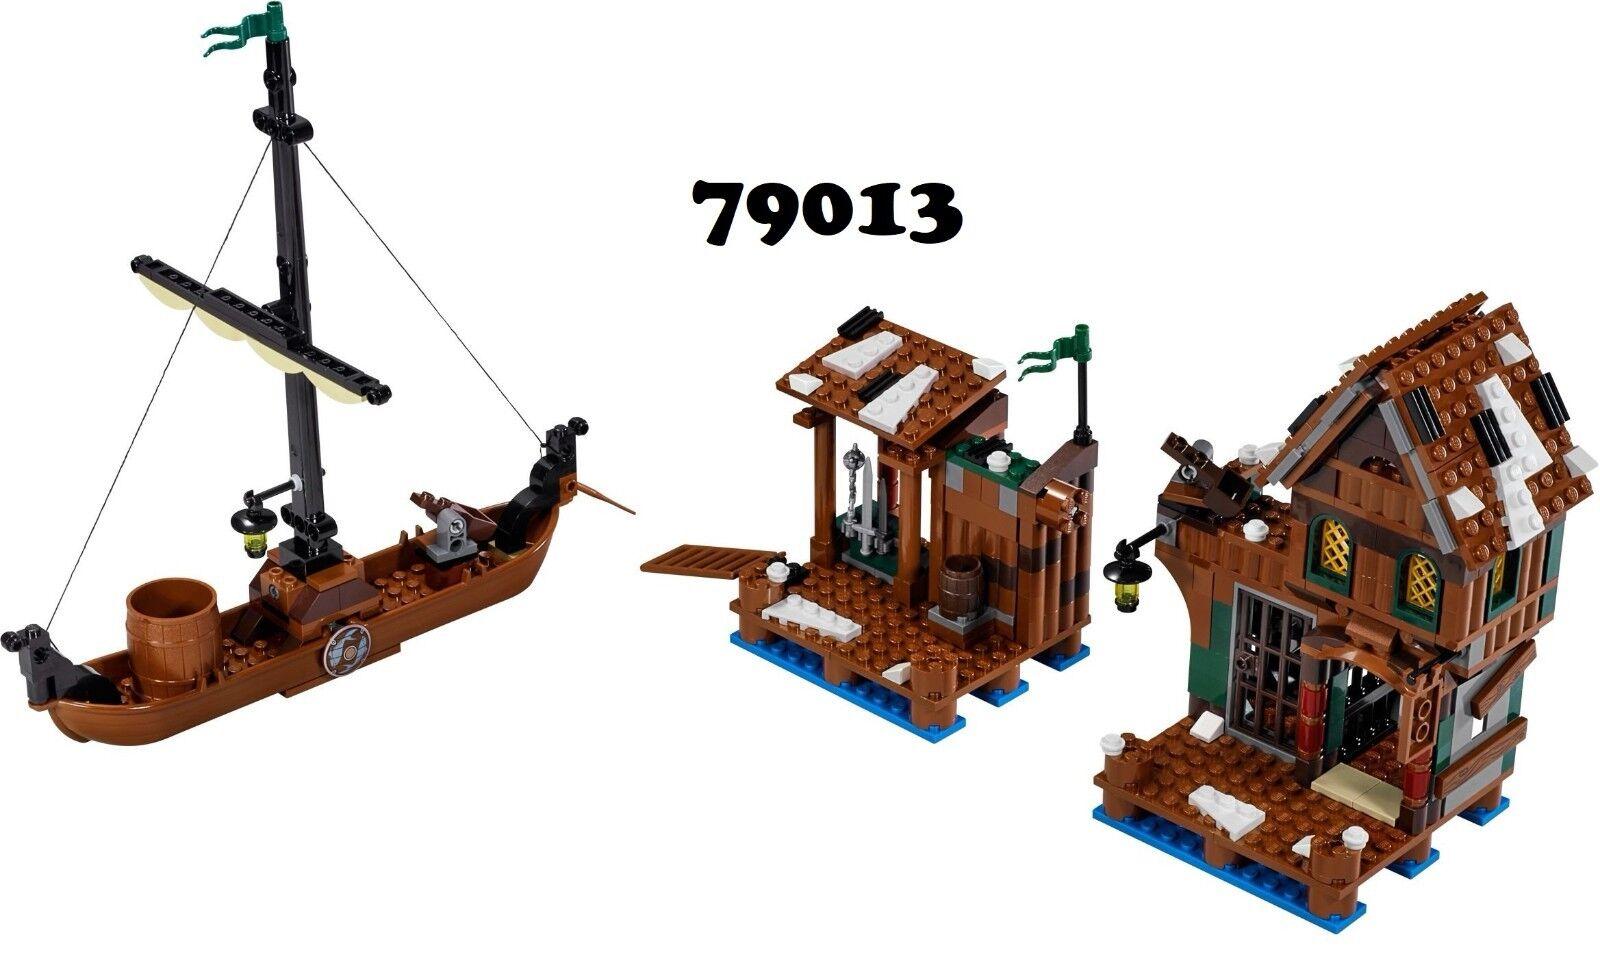 NUOVO   LEGO LOTR LO HOBBIT 79013 Lake-Town Chase   NO Minifigures